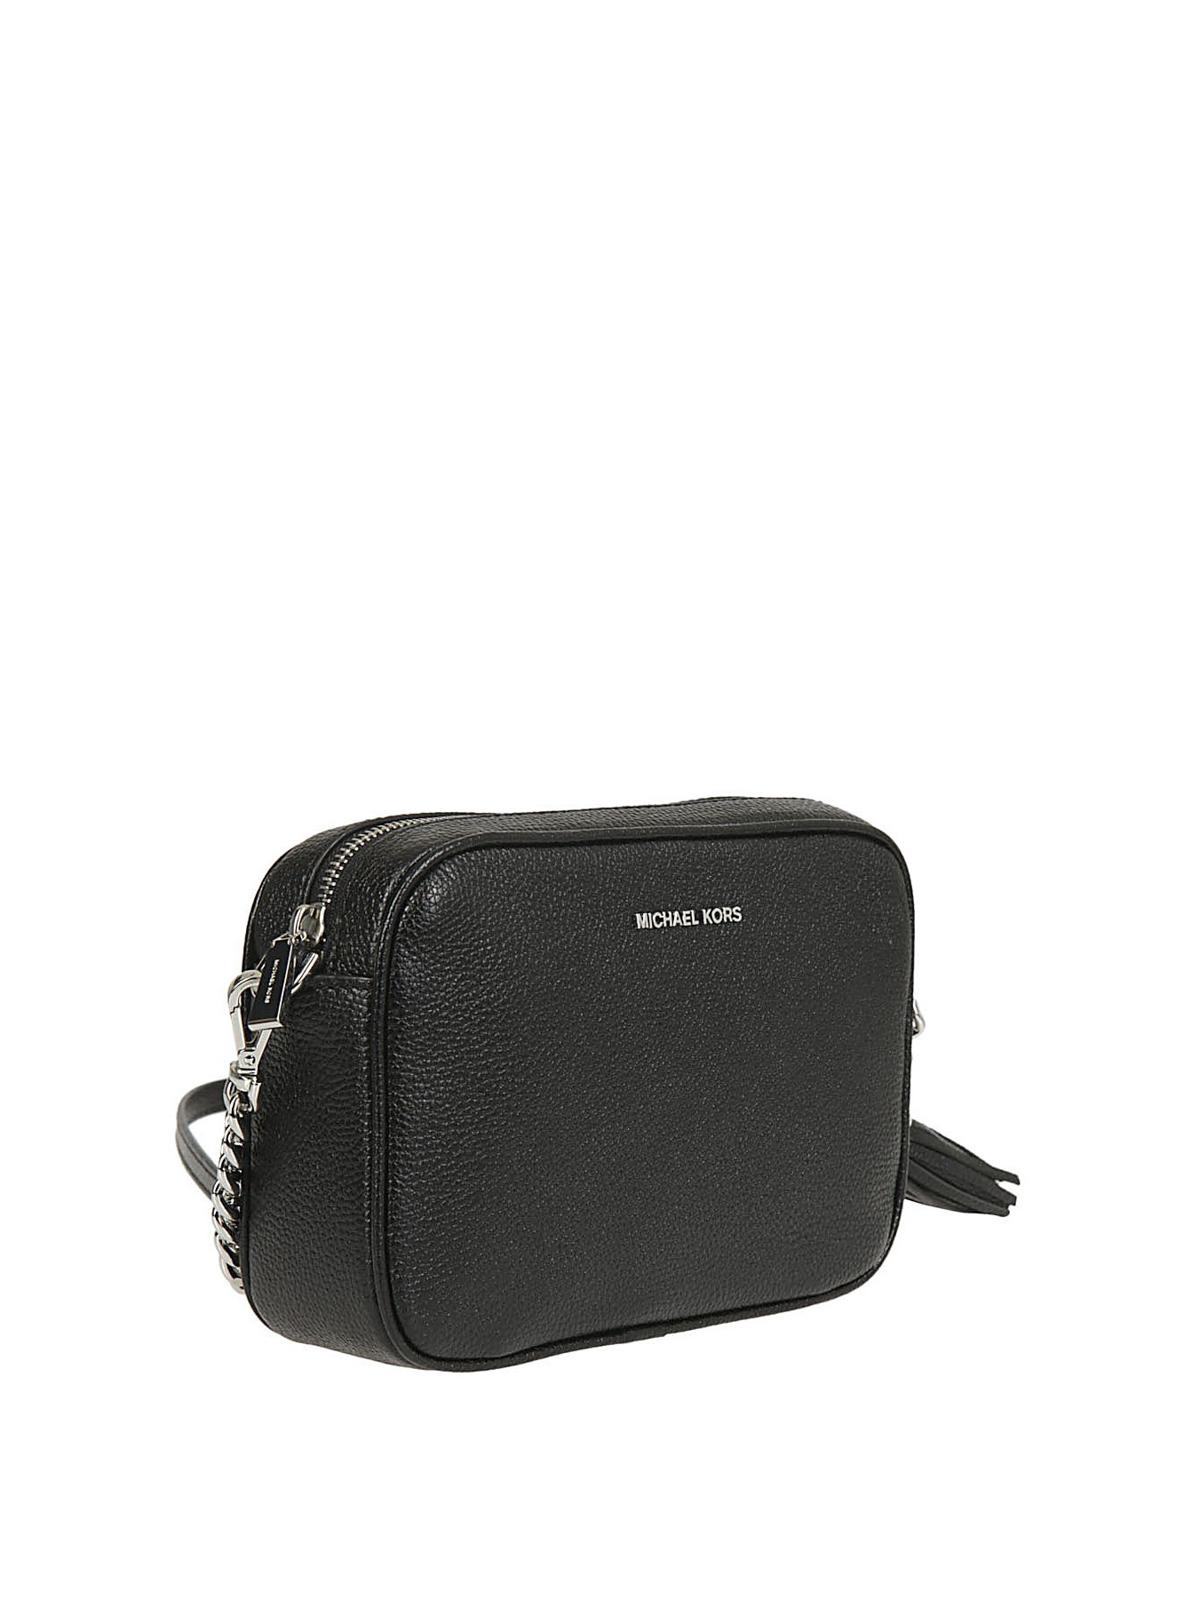 Michael Kors - Ginny black leather cross body bag - cross